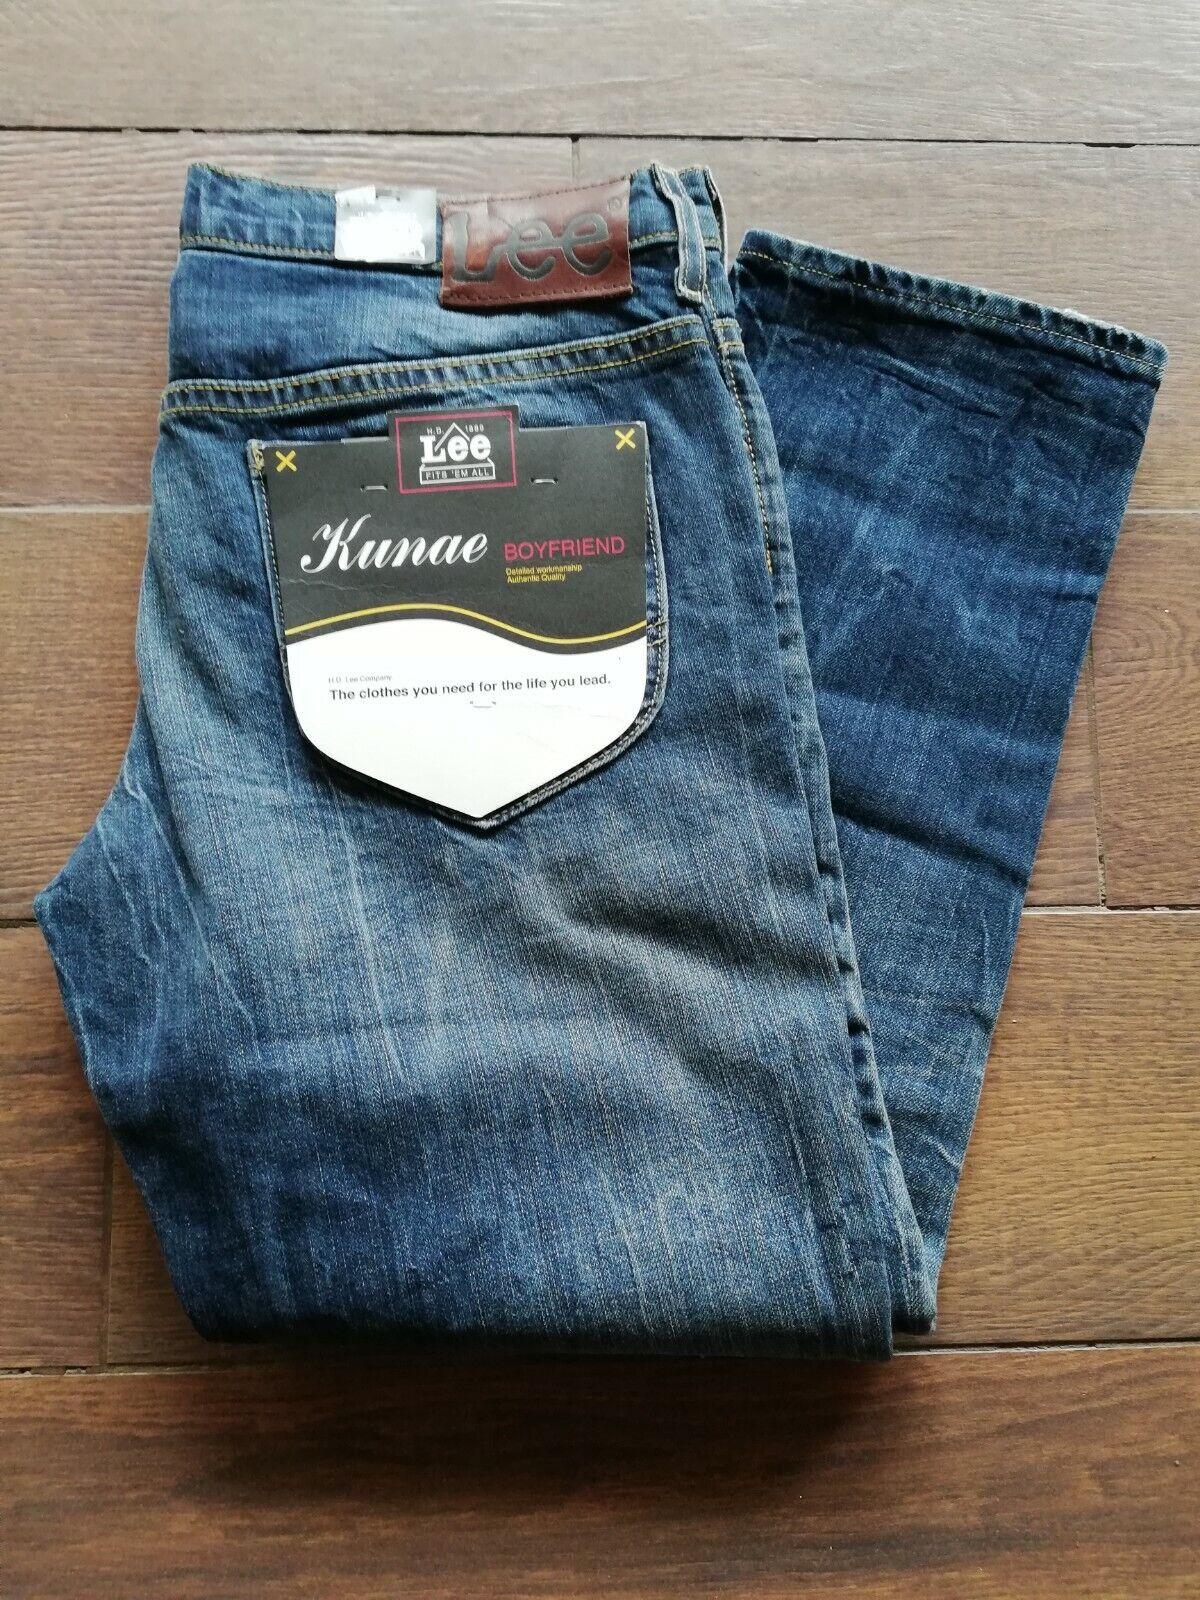 Original Lee Damen Jeans Kunae Boyfriend W28     L31 Jeans blau Neu | Mangelware  031592